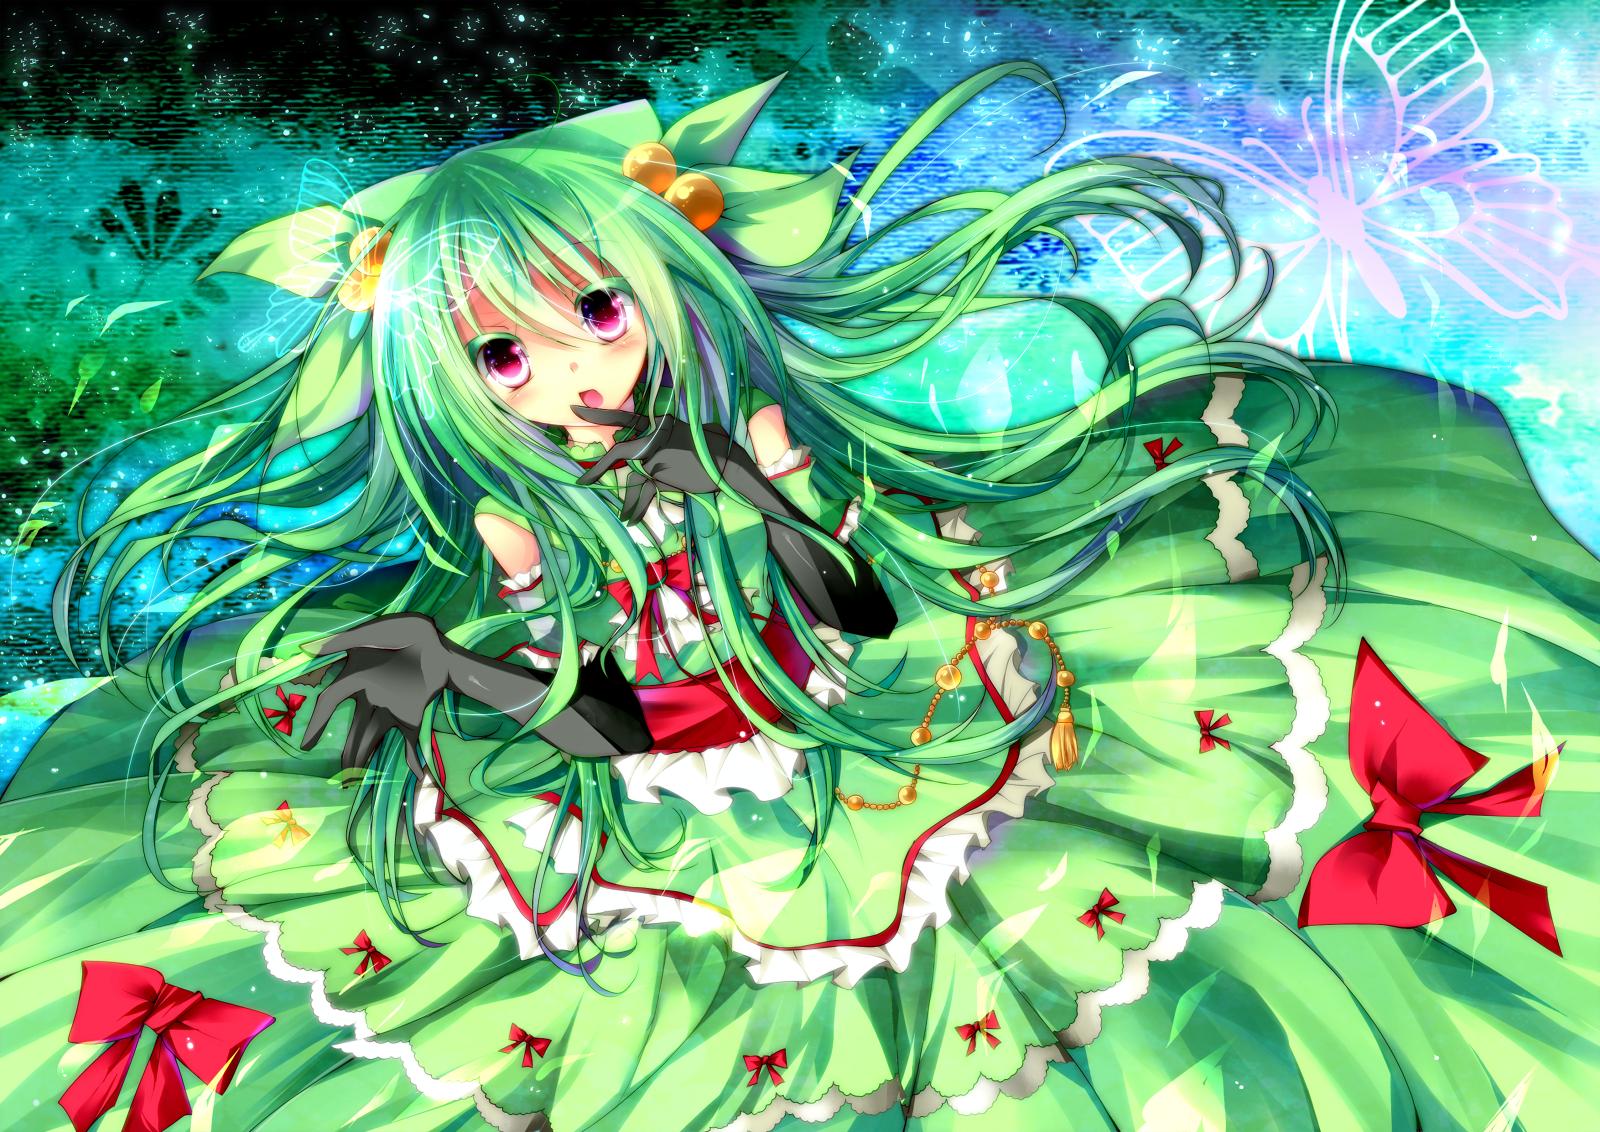 Sceptile Pok 233 Mon Image 474756 Zerochan Anime Image Board